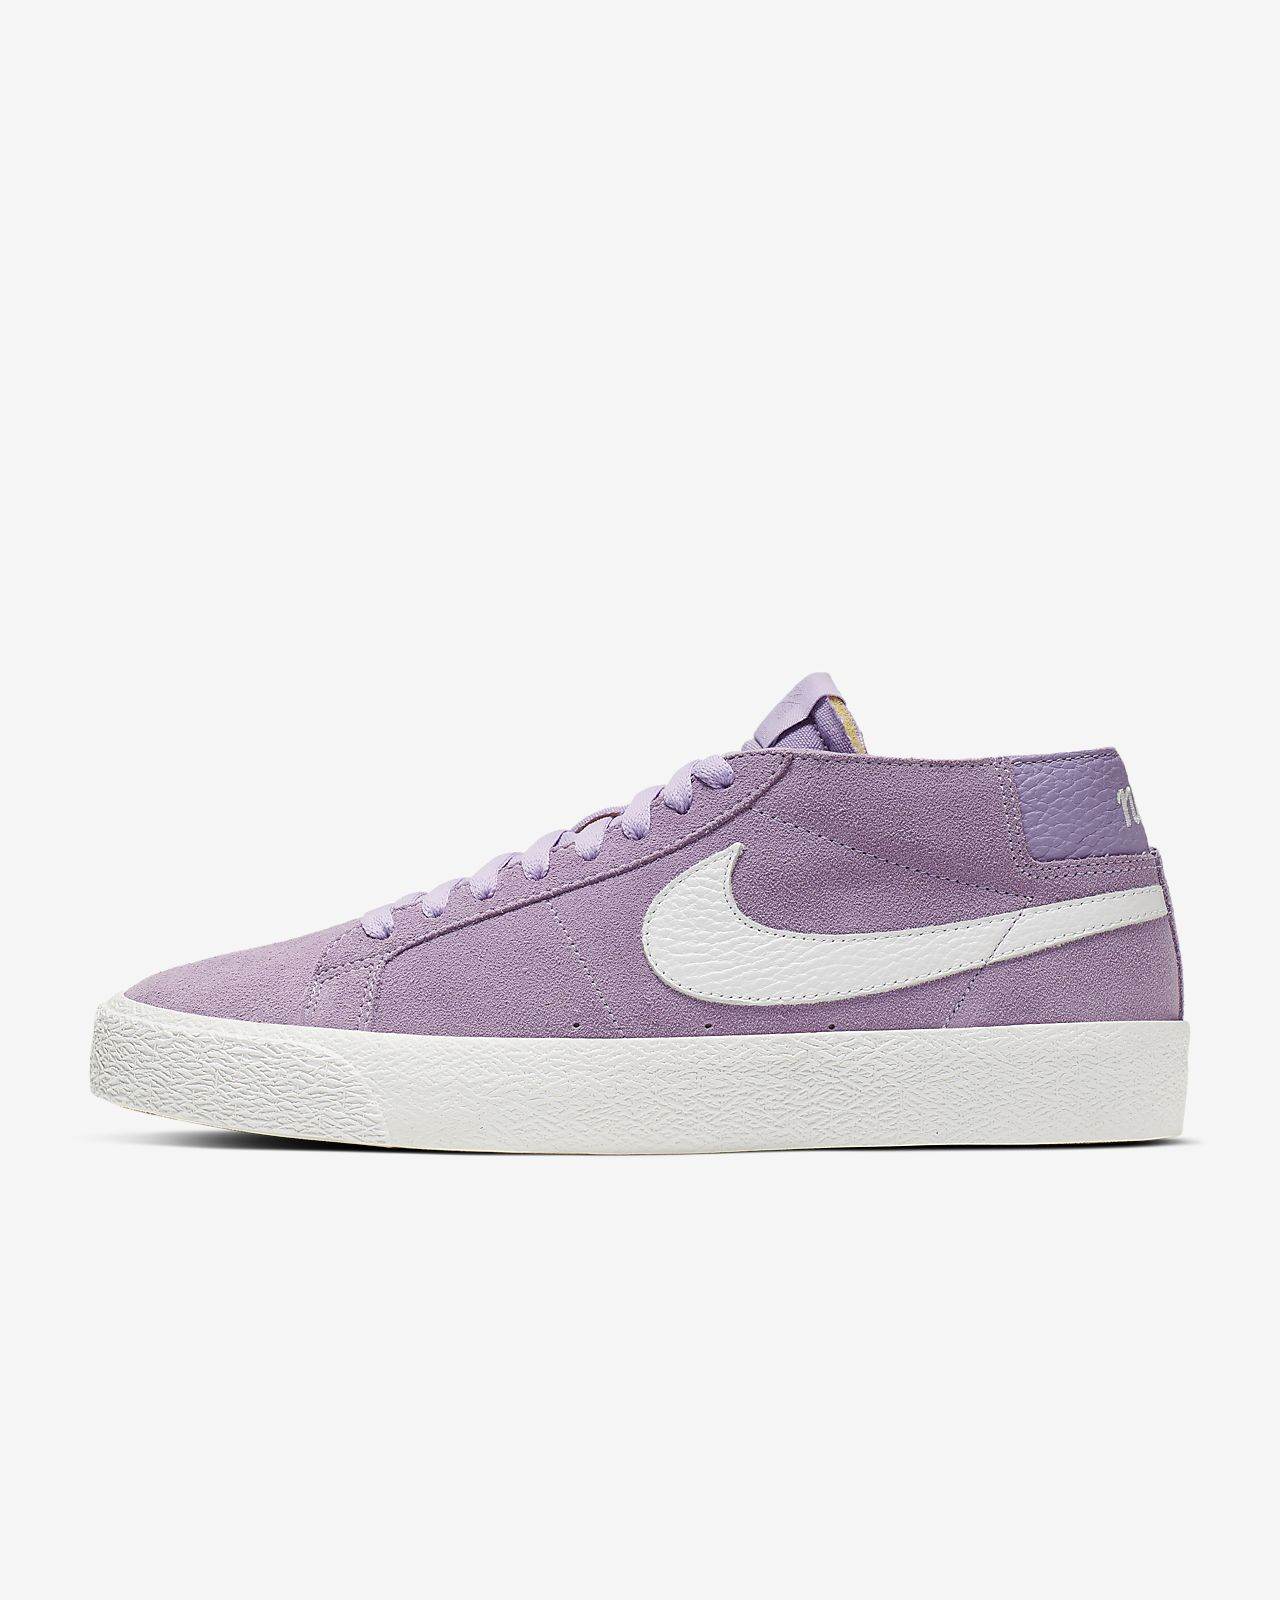 Nike SB Zoom Blazer Chukka Men's Skate Shoe